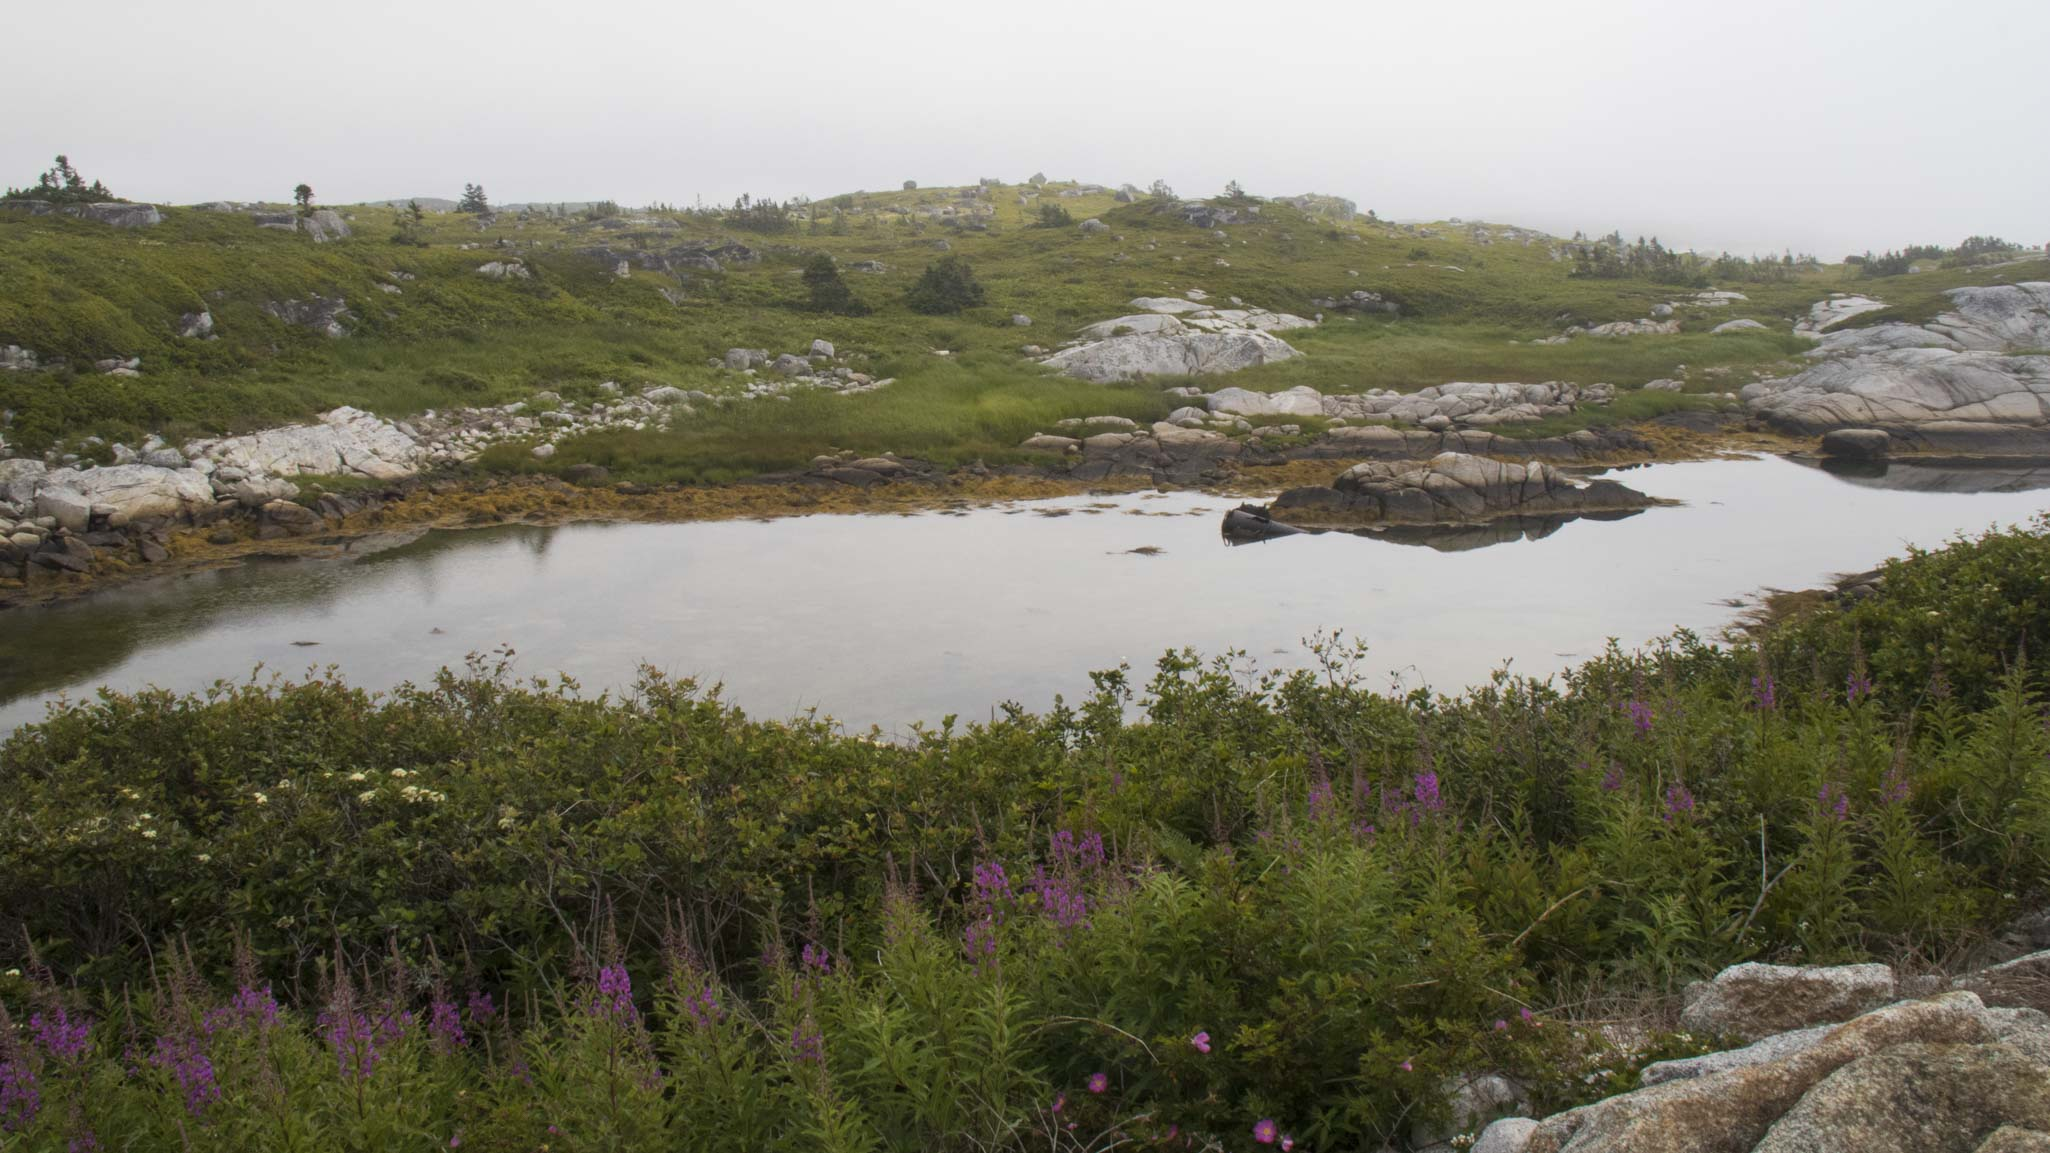 0718 Peggys Cove Landscape (1 of 1)